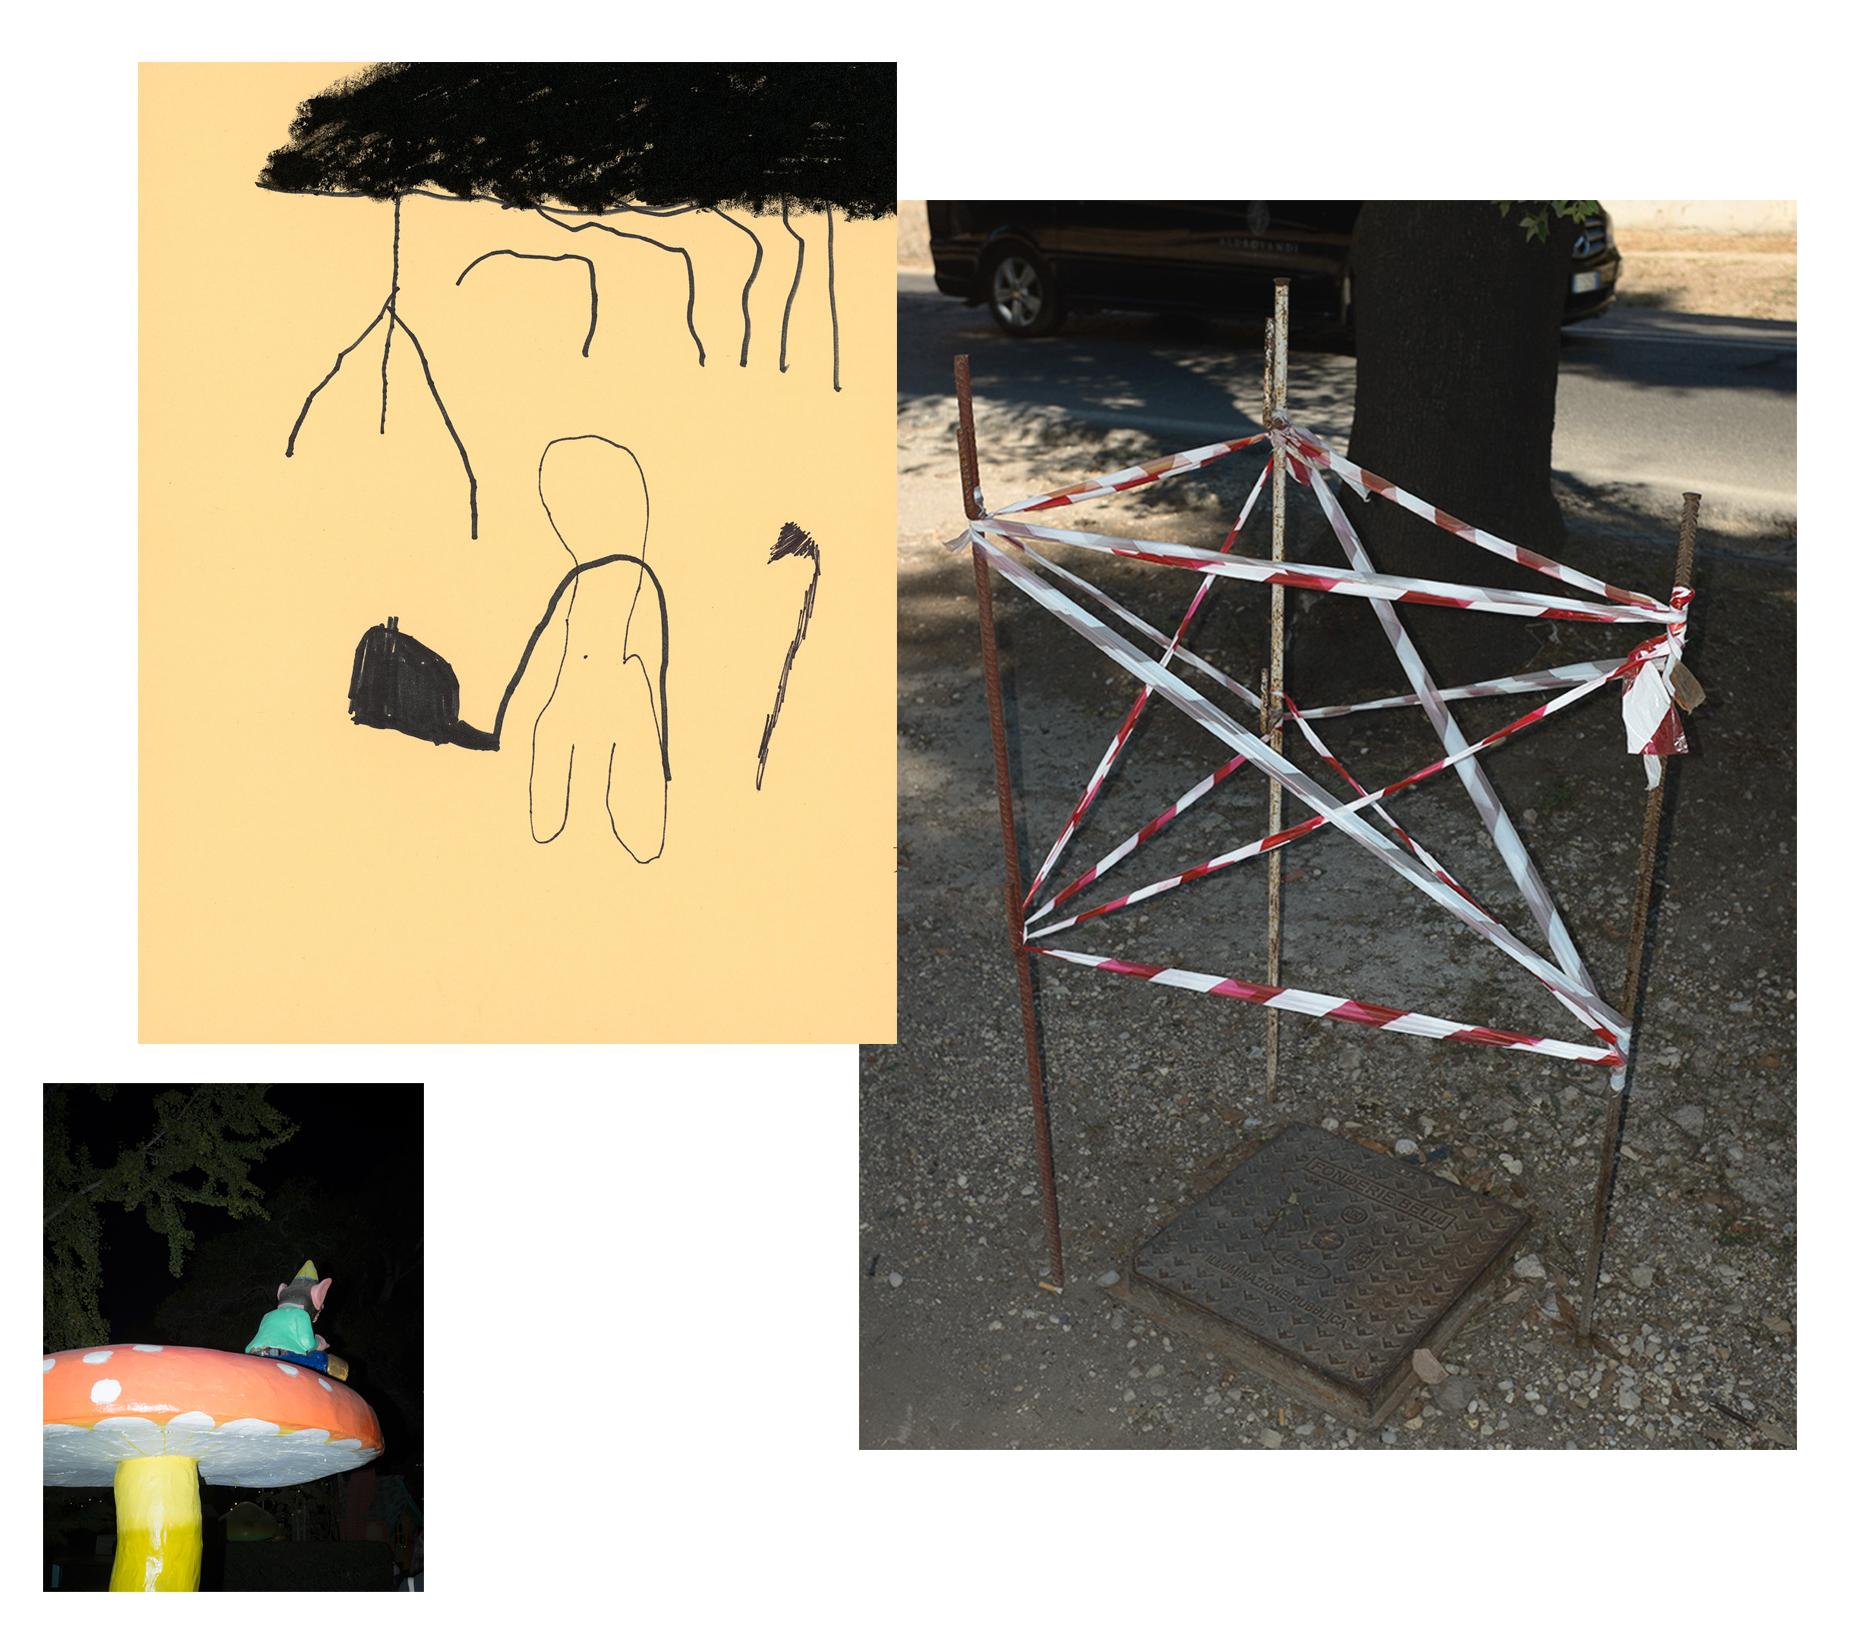 Graham-Holoch-Group-Study-Tiles-Magic-Trick-4-2